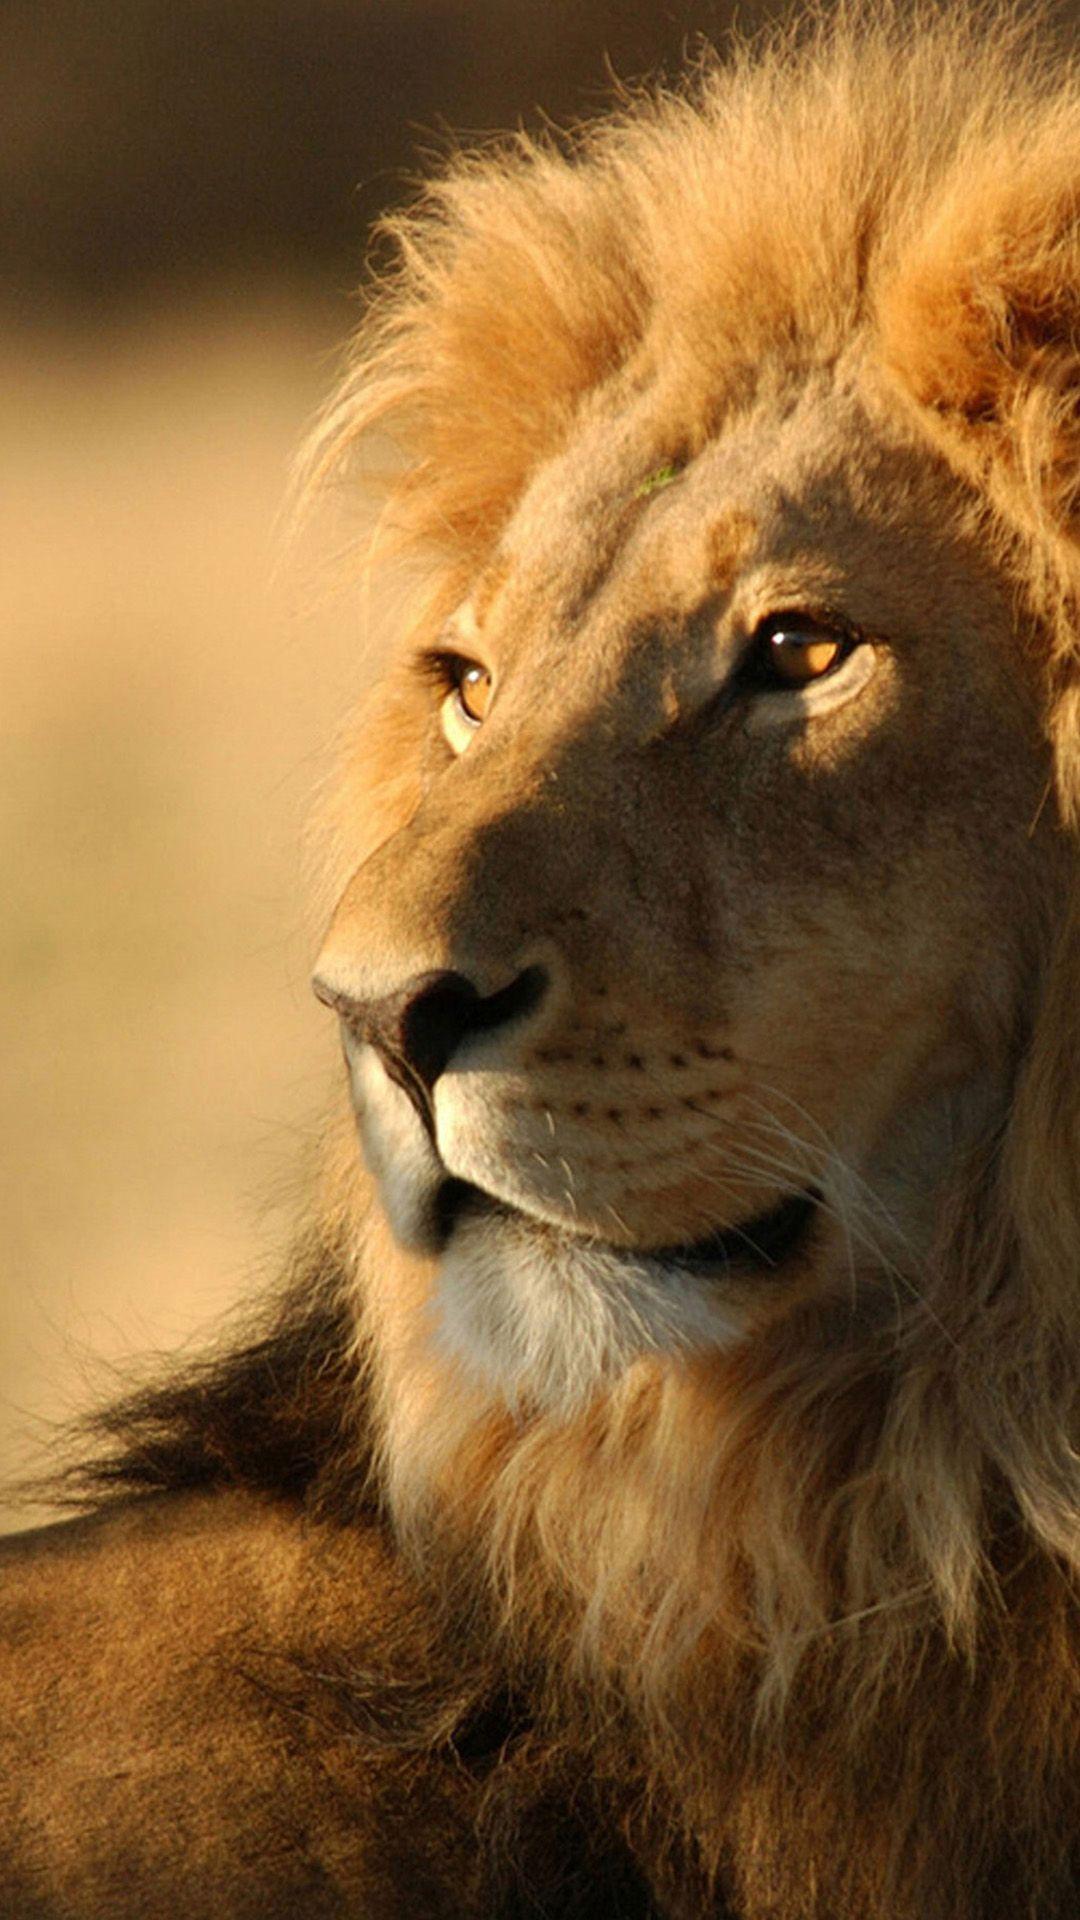 Wild lion Sony Xperia Z2 Wallpapers | Xperia Z2 Wallpaper